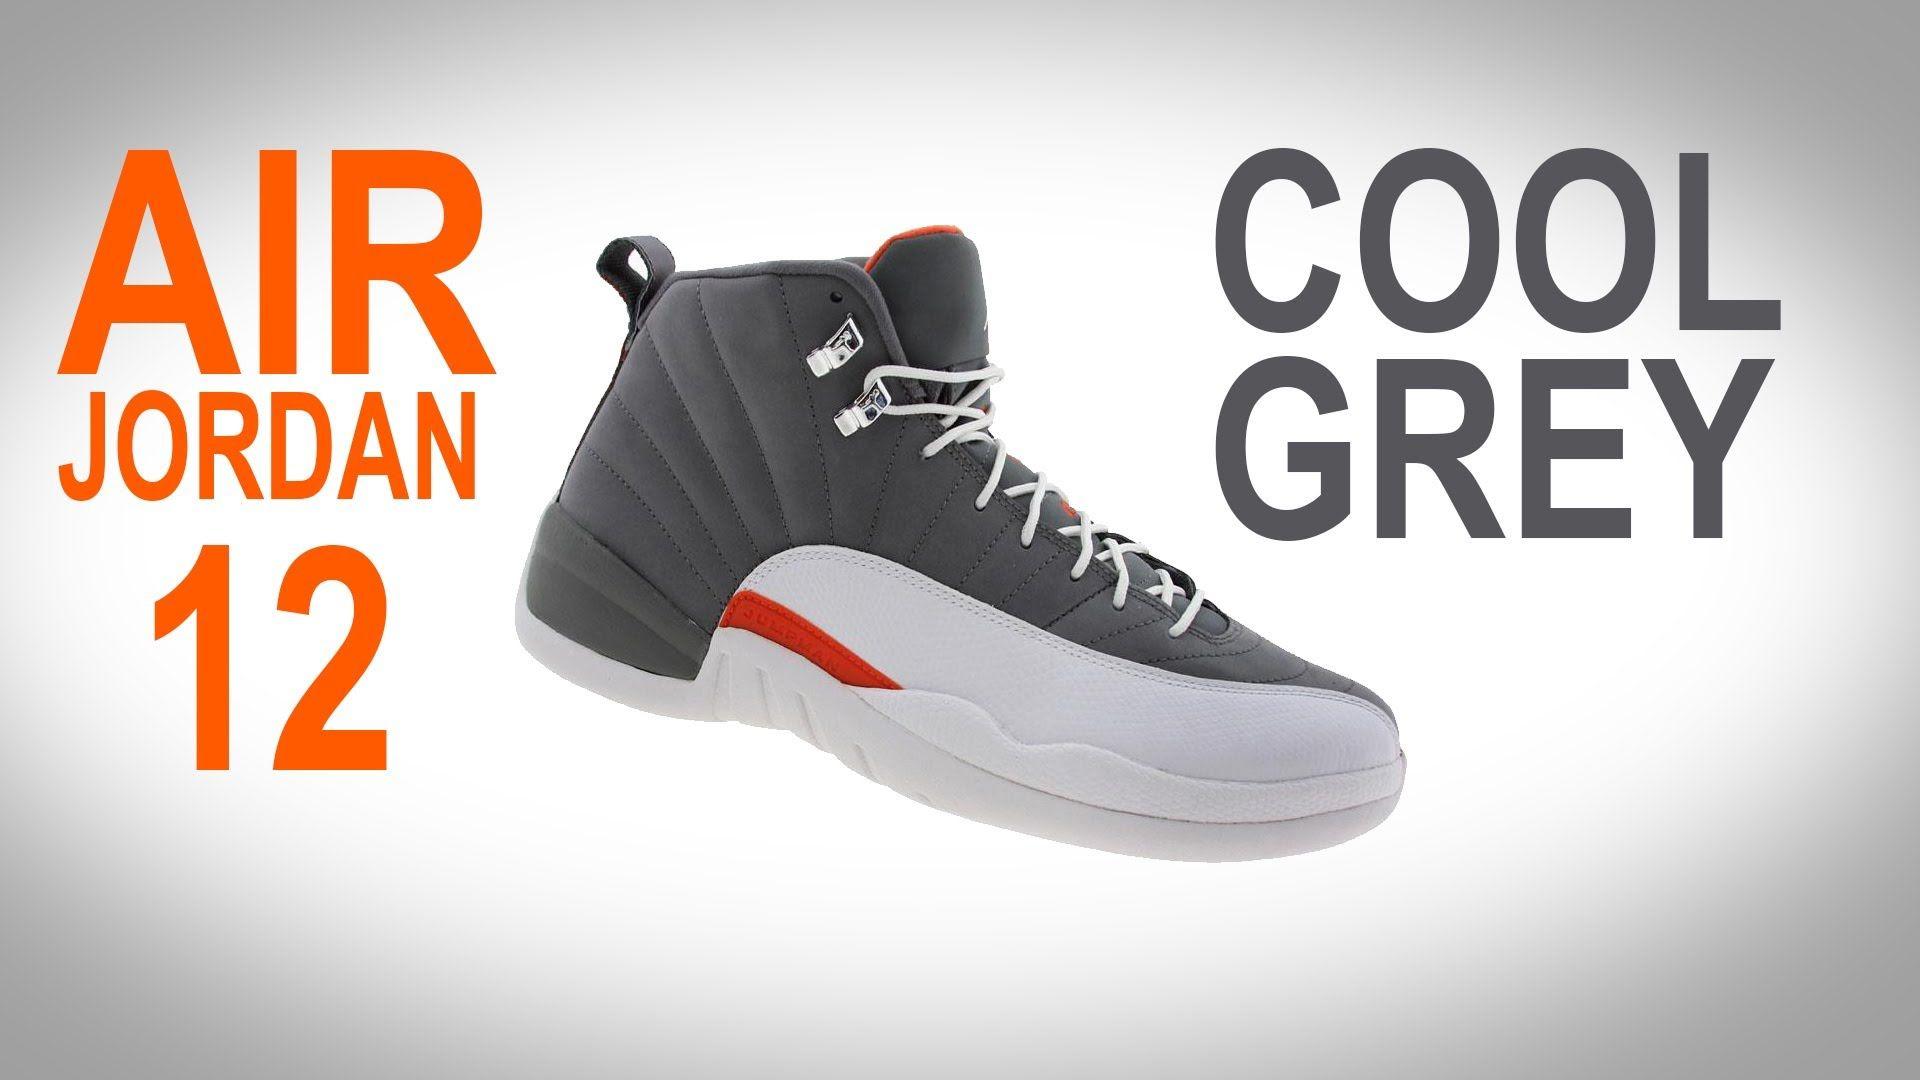 867e643b156 Nike Air Jordan 12 Xii Retro Cool Grey Team Orange | Mens Health Network